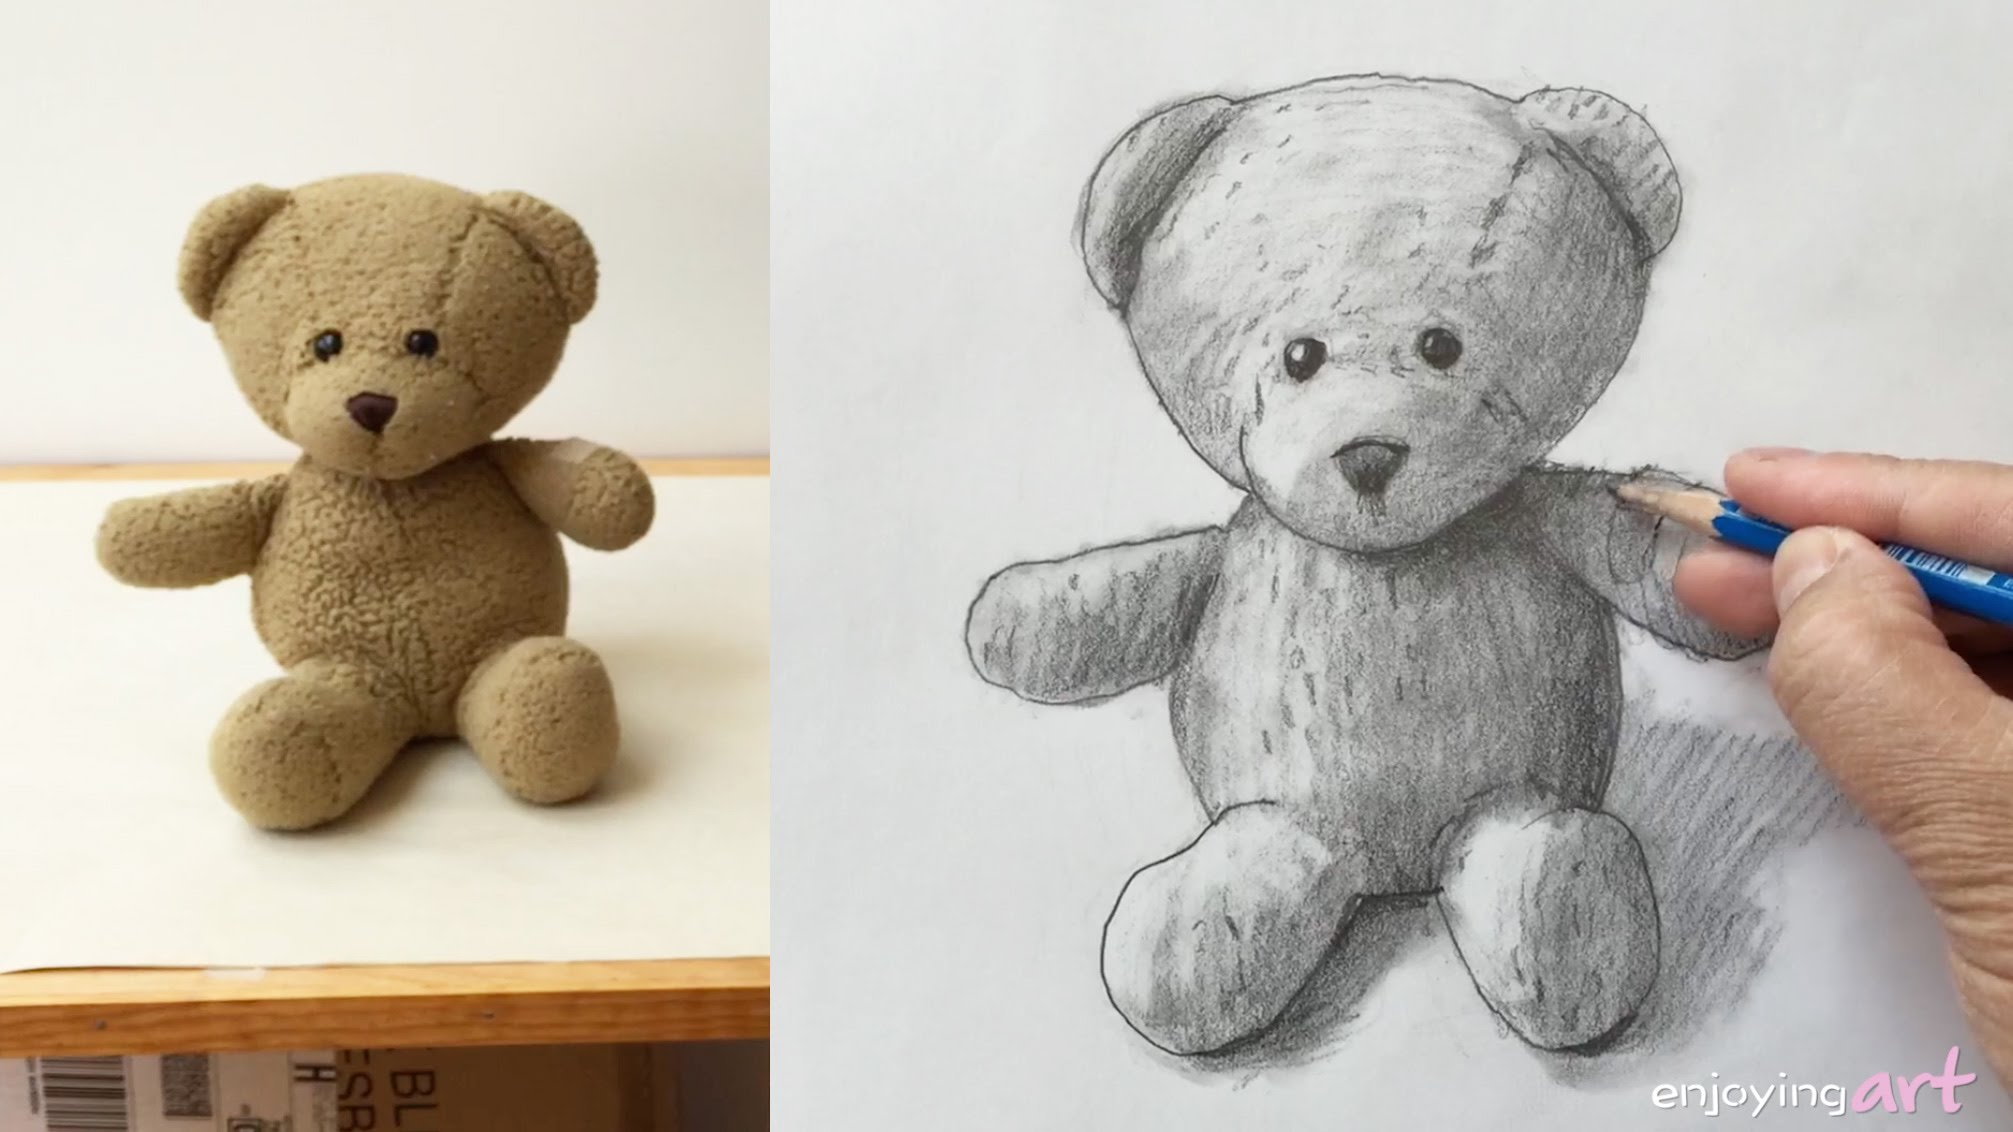 2013x1132 How To Draw A Teddy Bear